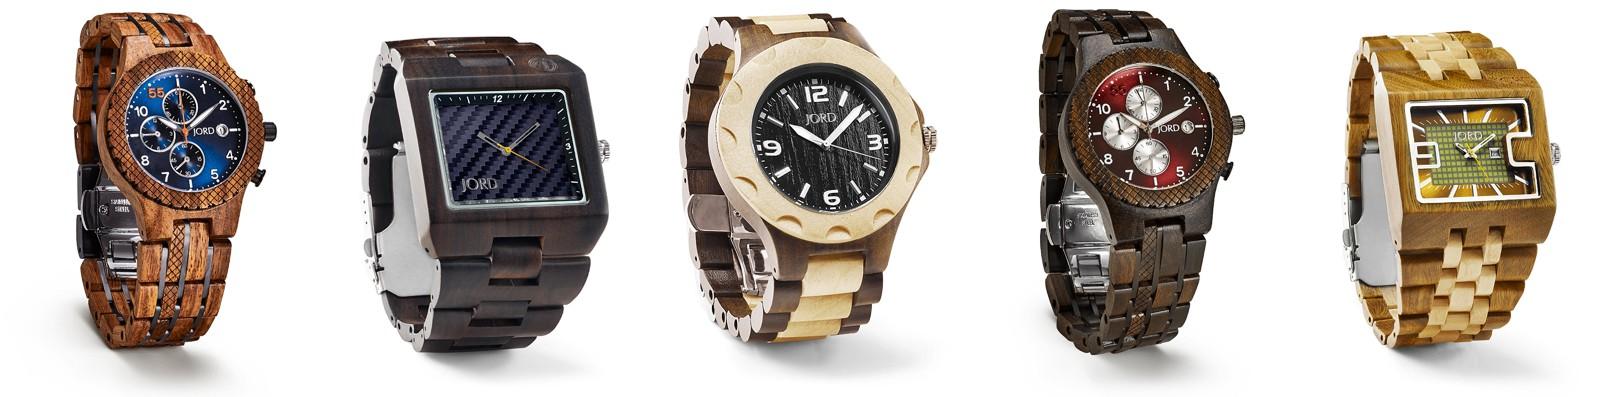 wood-watches-mens-women-jord